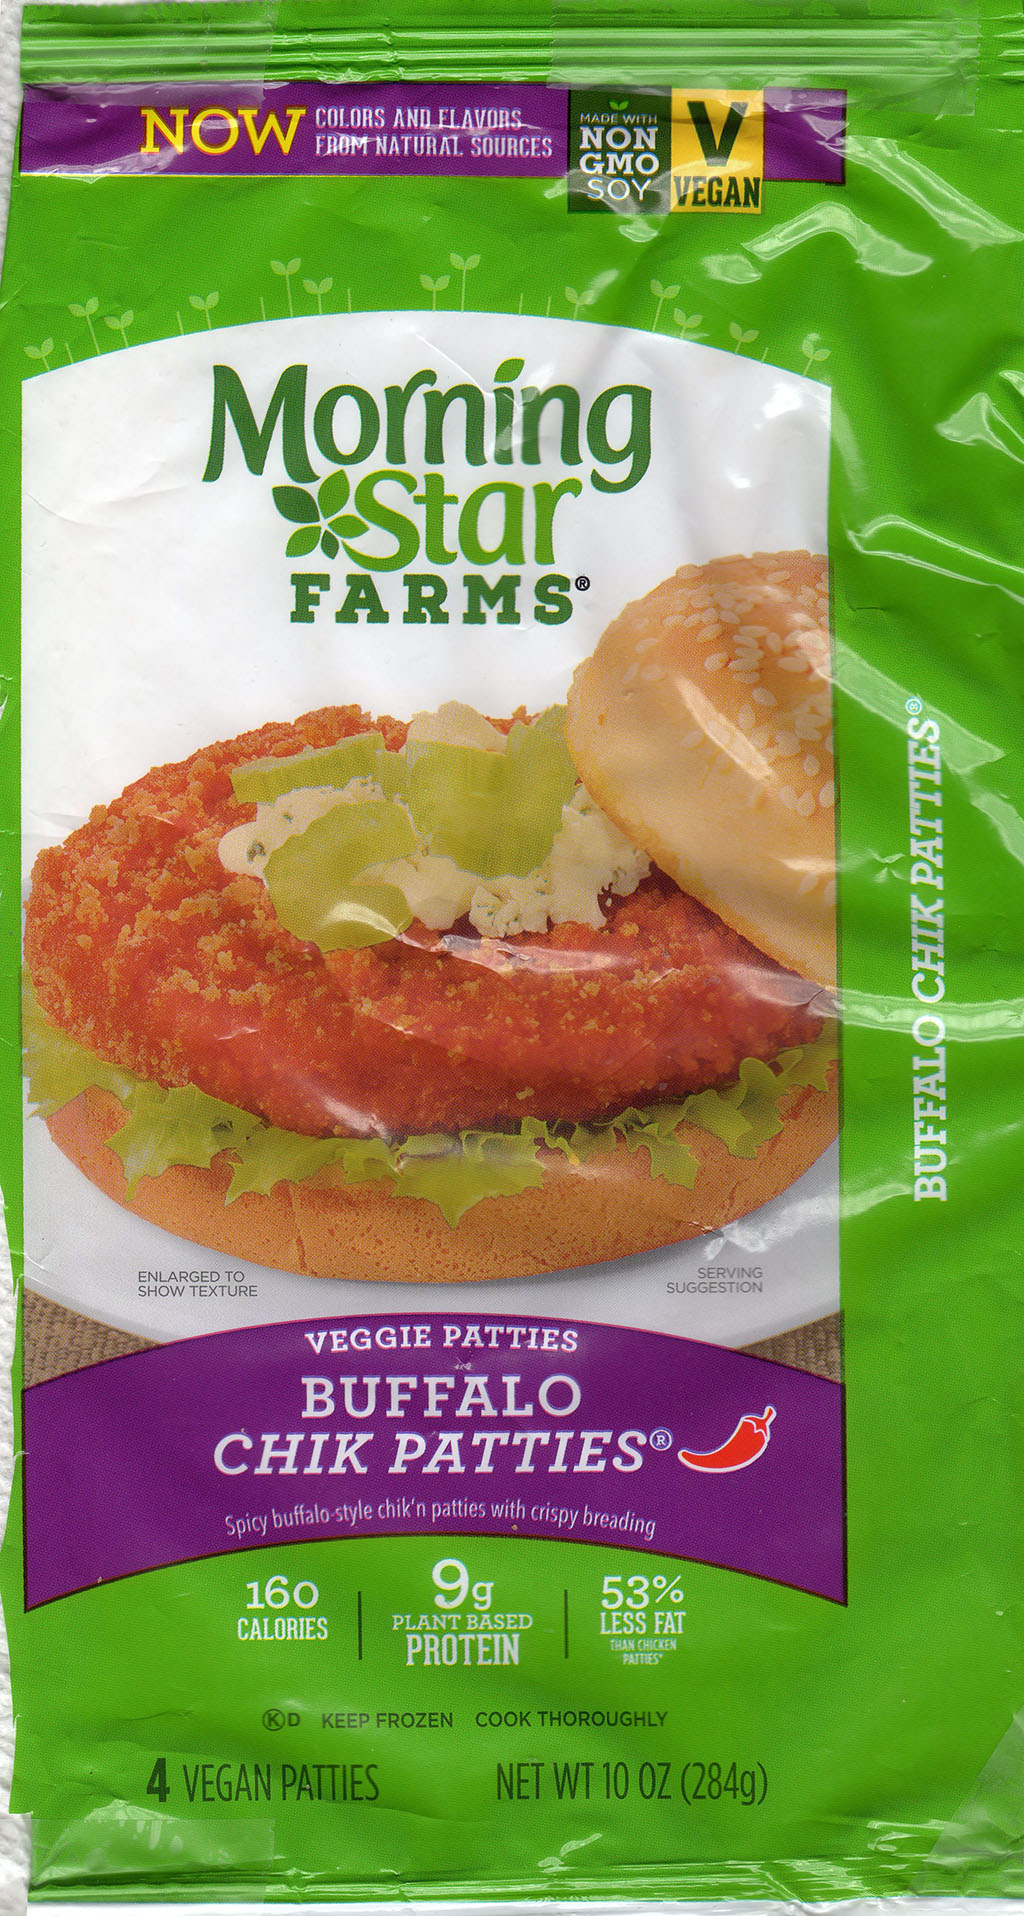 MorningStar Farms Buffalo Chik Patties 2019 package front vegan